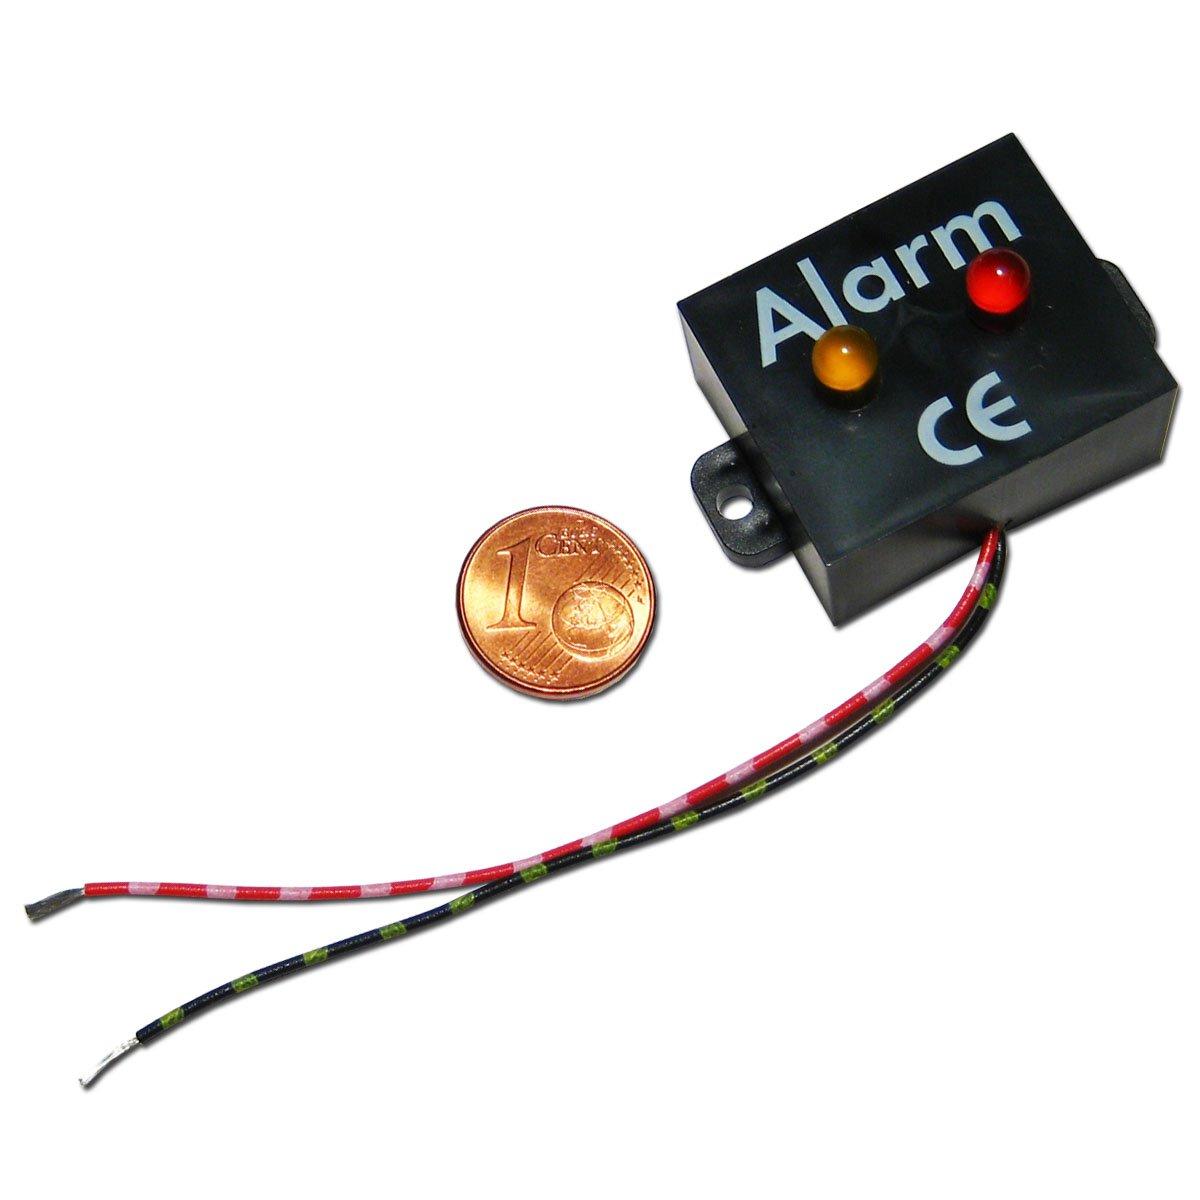 Alarm-Monitor KEMO - Alarm Atrappe / Dummy M061 88100023